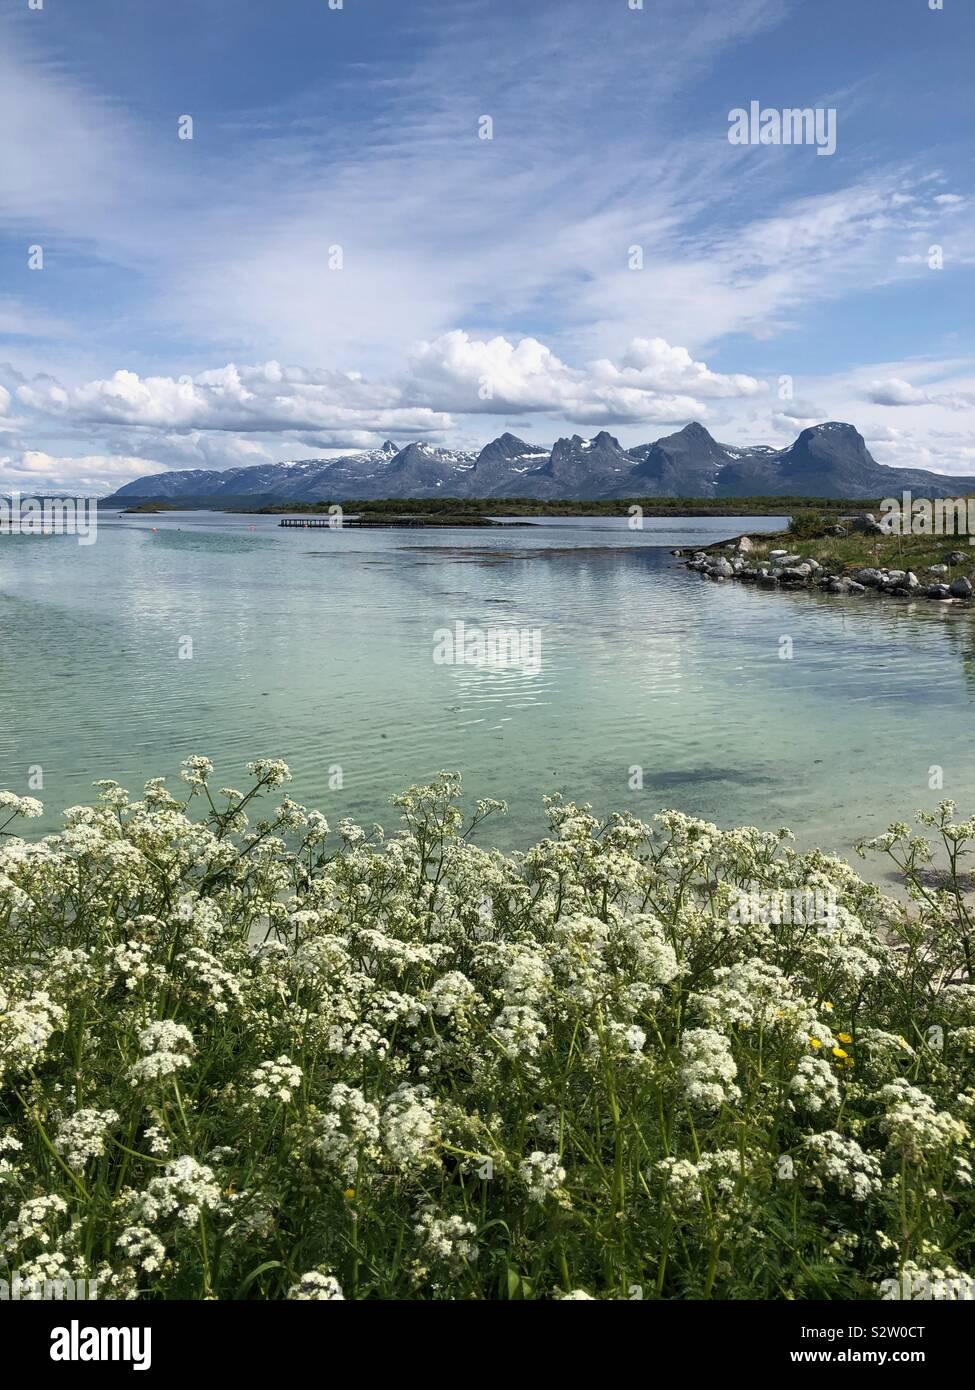 Le sette sorelle mountain range a Heroy Isola, Norvegia. Foto Stock